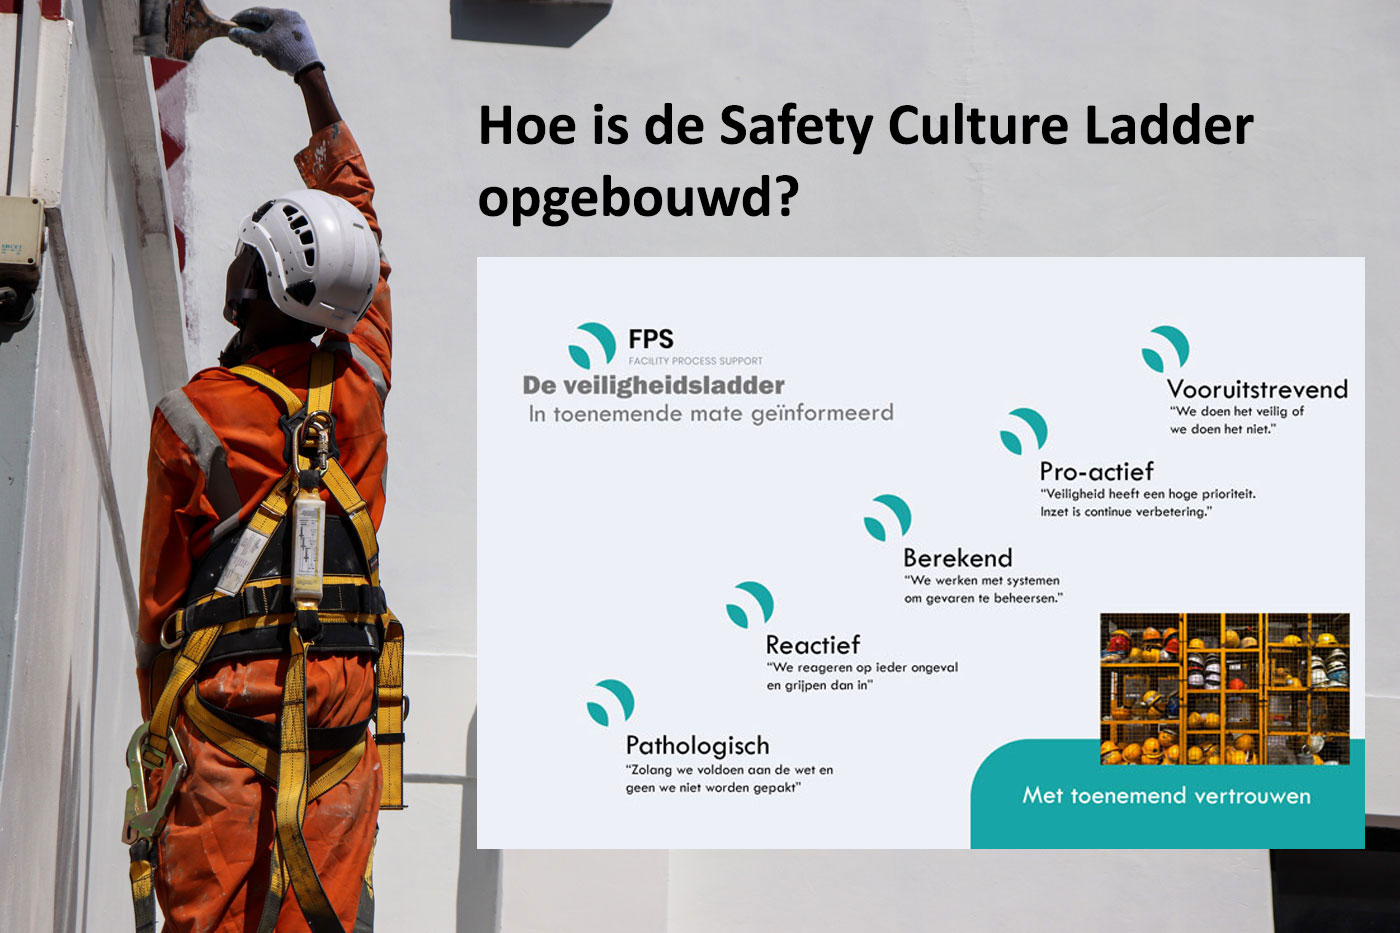 Safety-culture-ladder-bouw-infra